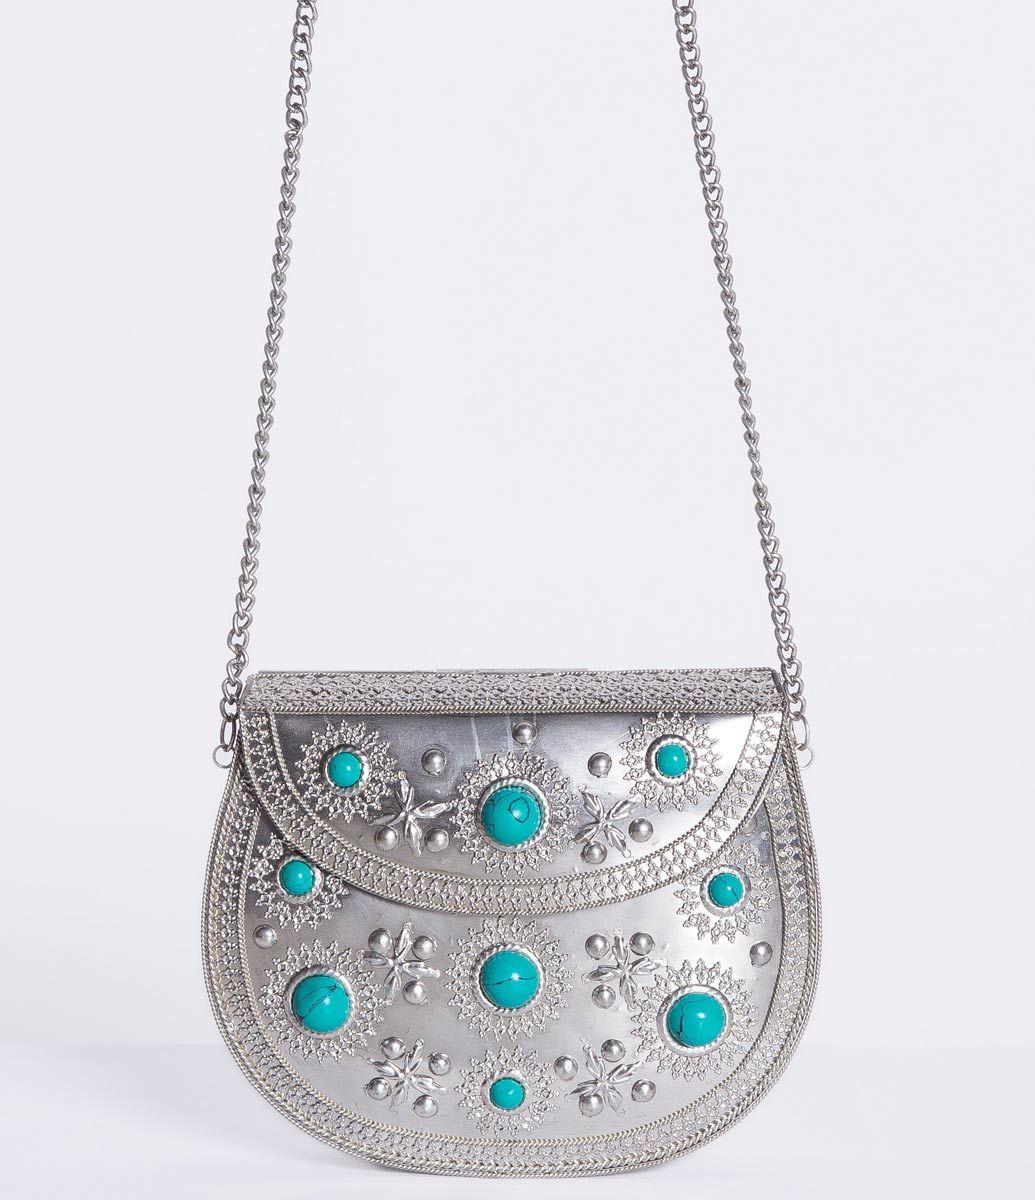 b8c1dd36c Bolsa Feminina Metalizada com Pedraria - Lojas Renner - R$90 ...